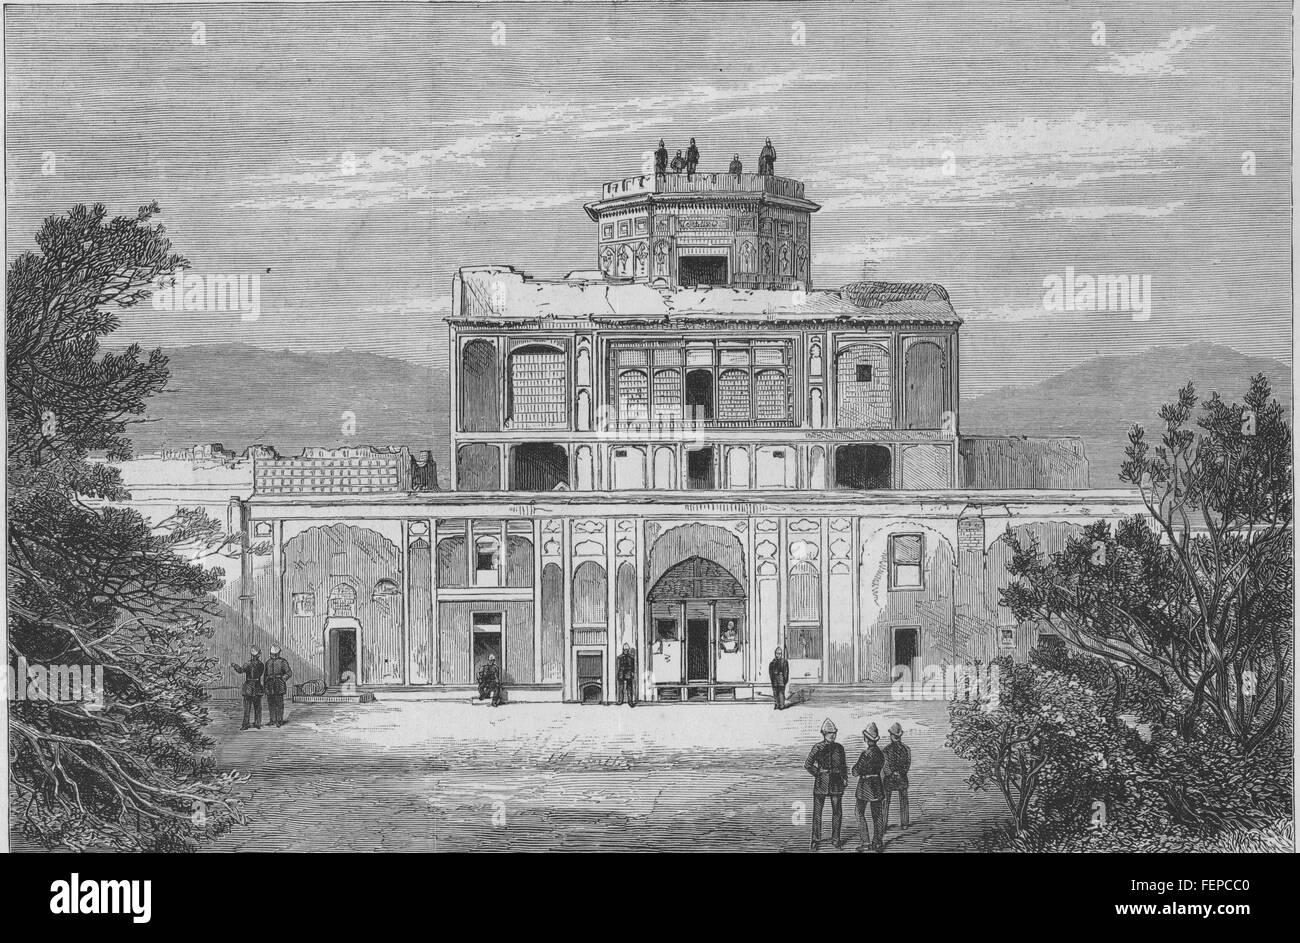 KANDAHAR sec Anglo-Afghan War Old Palace inside Citadel. Afghanistan 1880. Illustrated London News - Stock Image